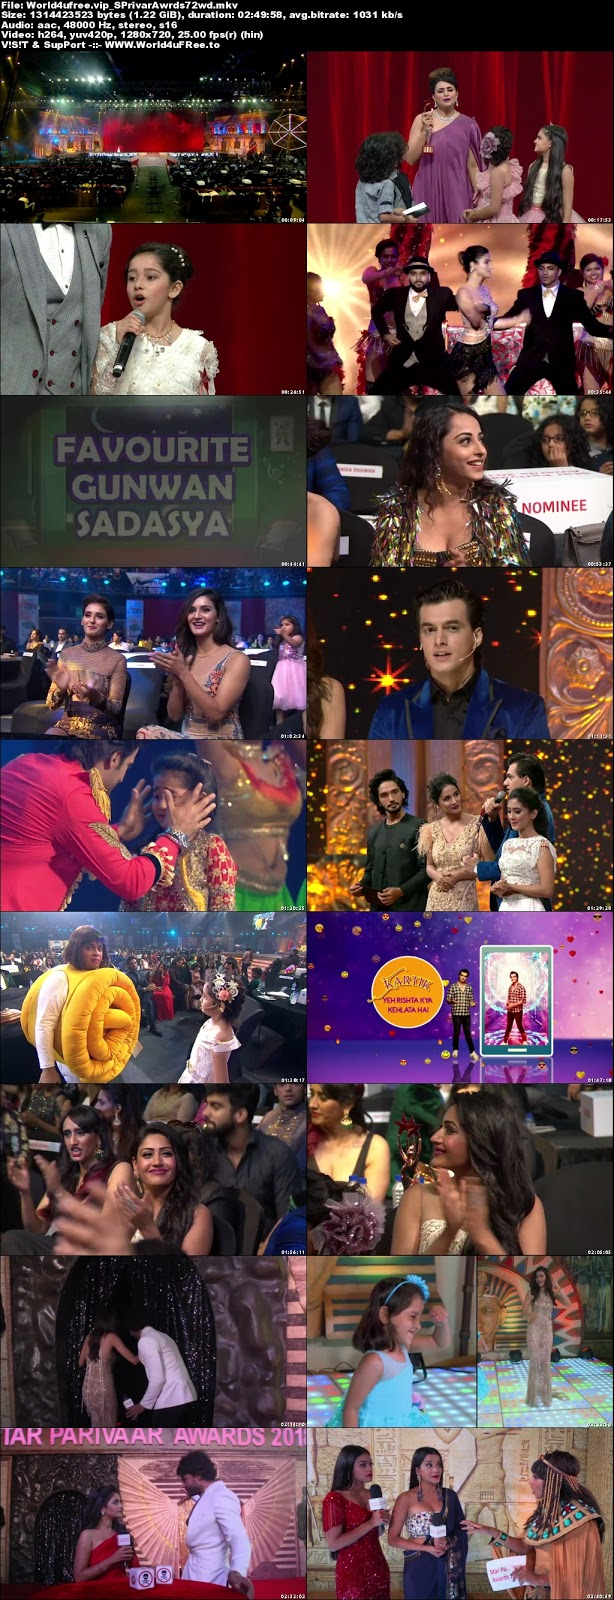 Star Parivaar Awards 2018 Hindi 720p WEBHD 1.2Gb x264 world4ufree.fun tv show Star Parivaar Awards 2018 Main Event hindi tv show tv show compressed small size free download or watch online at world4ufree.fun